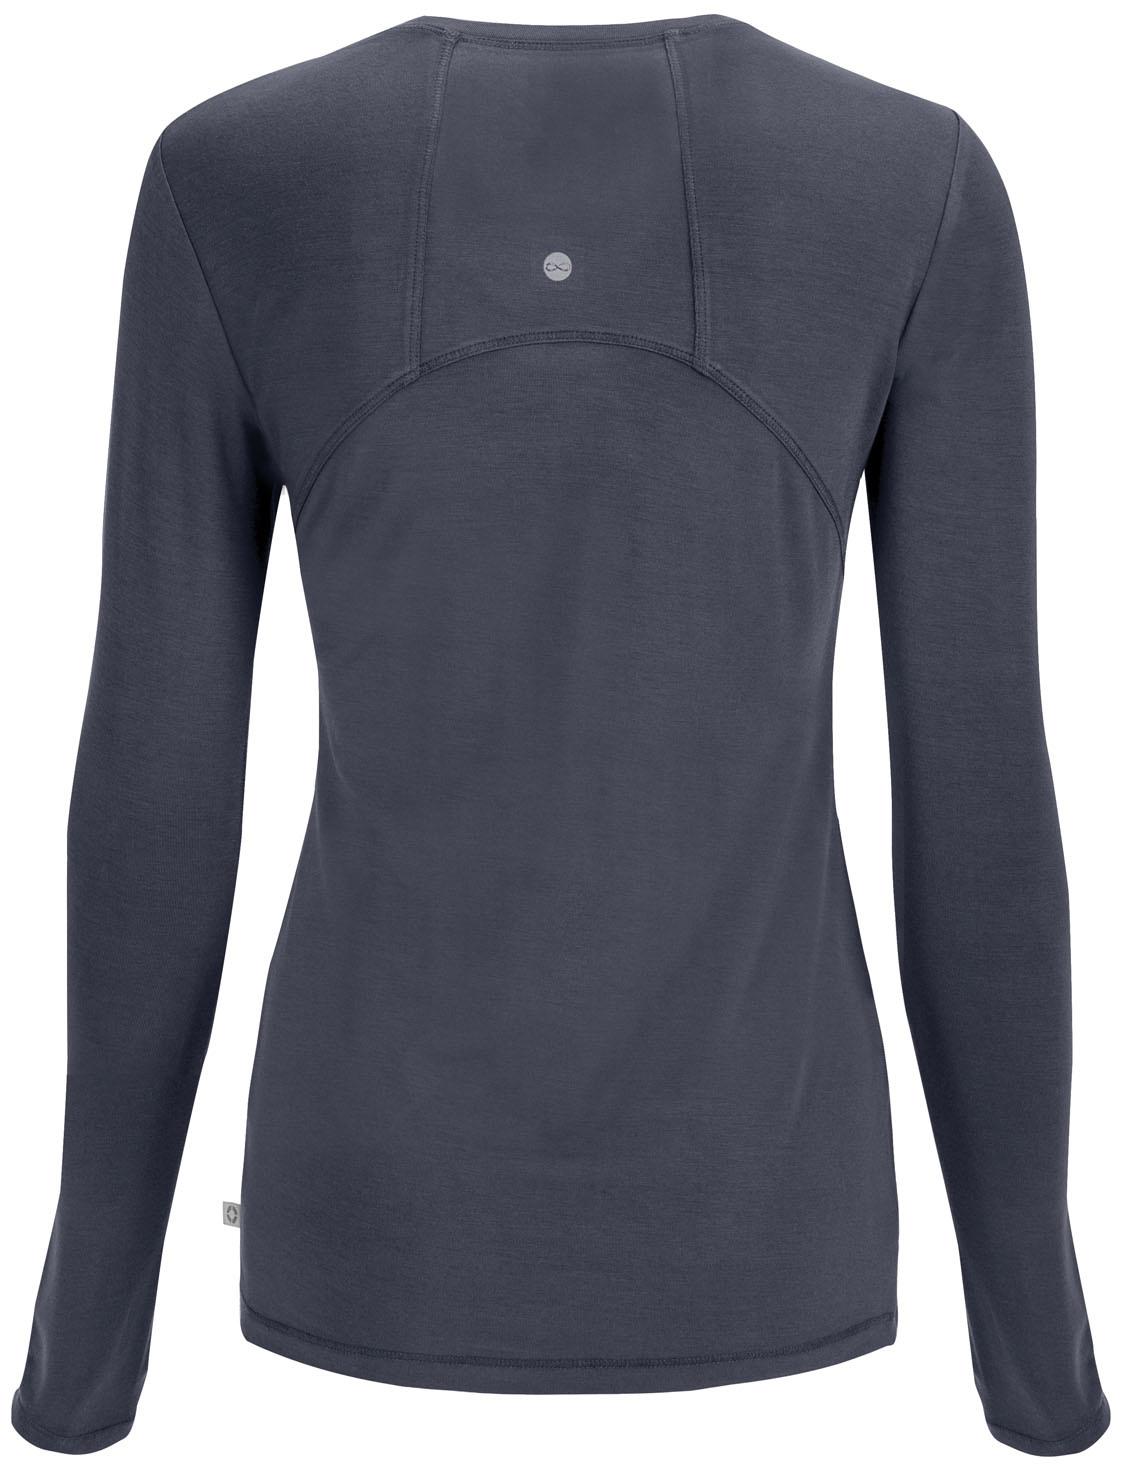 CHEROKEE Pewter Grey Long Sleeve Women's Underscrub Shirts 2626A